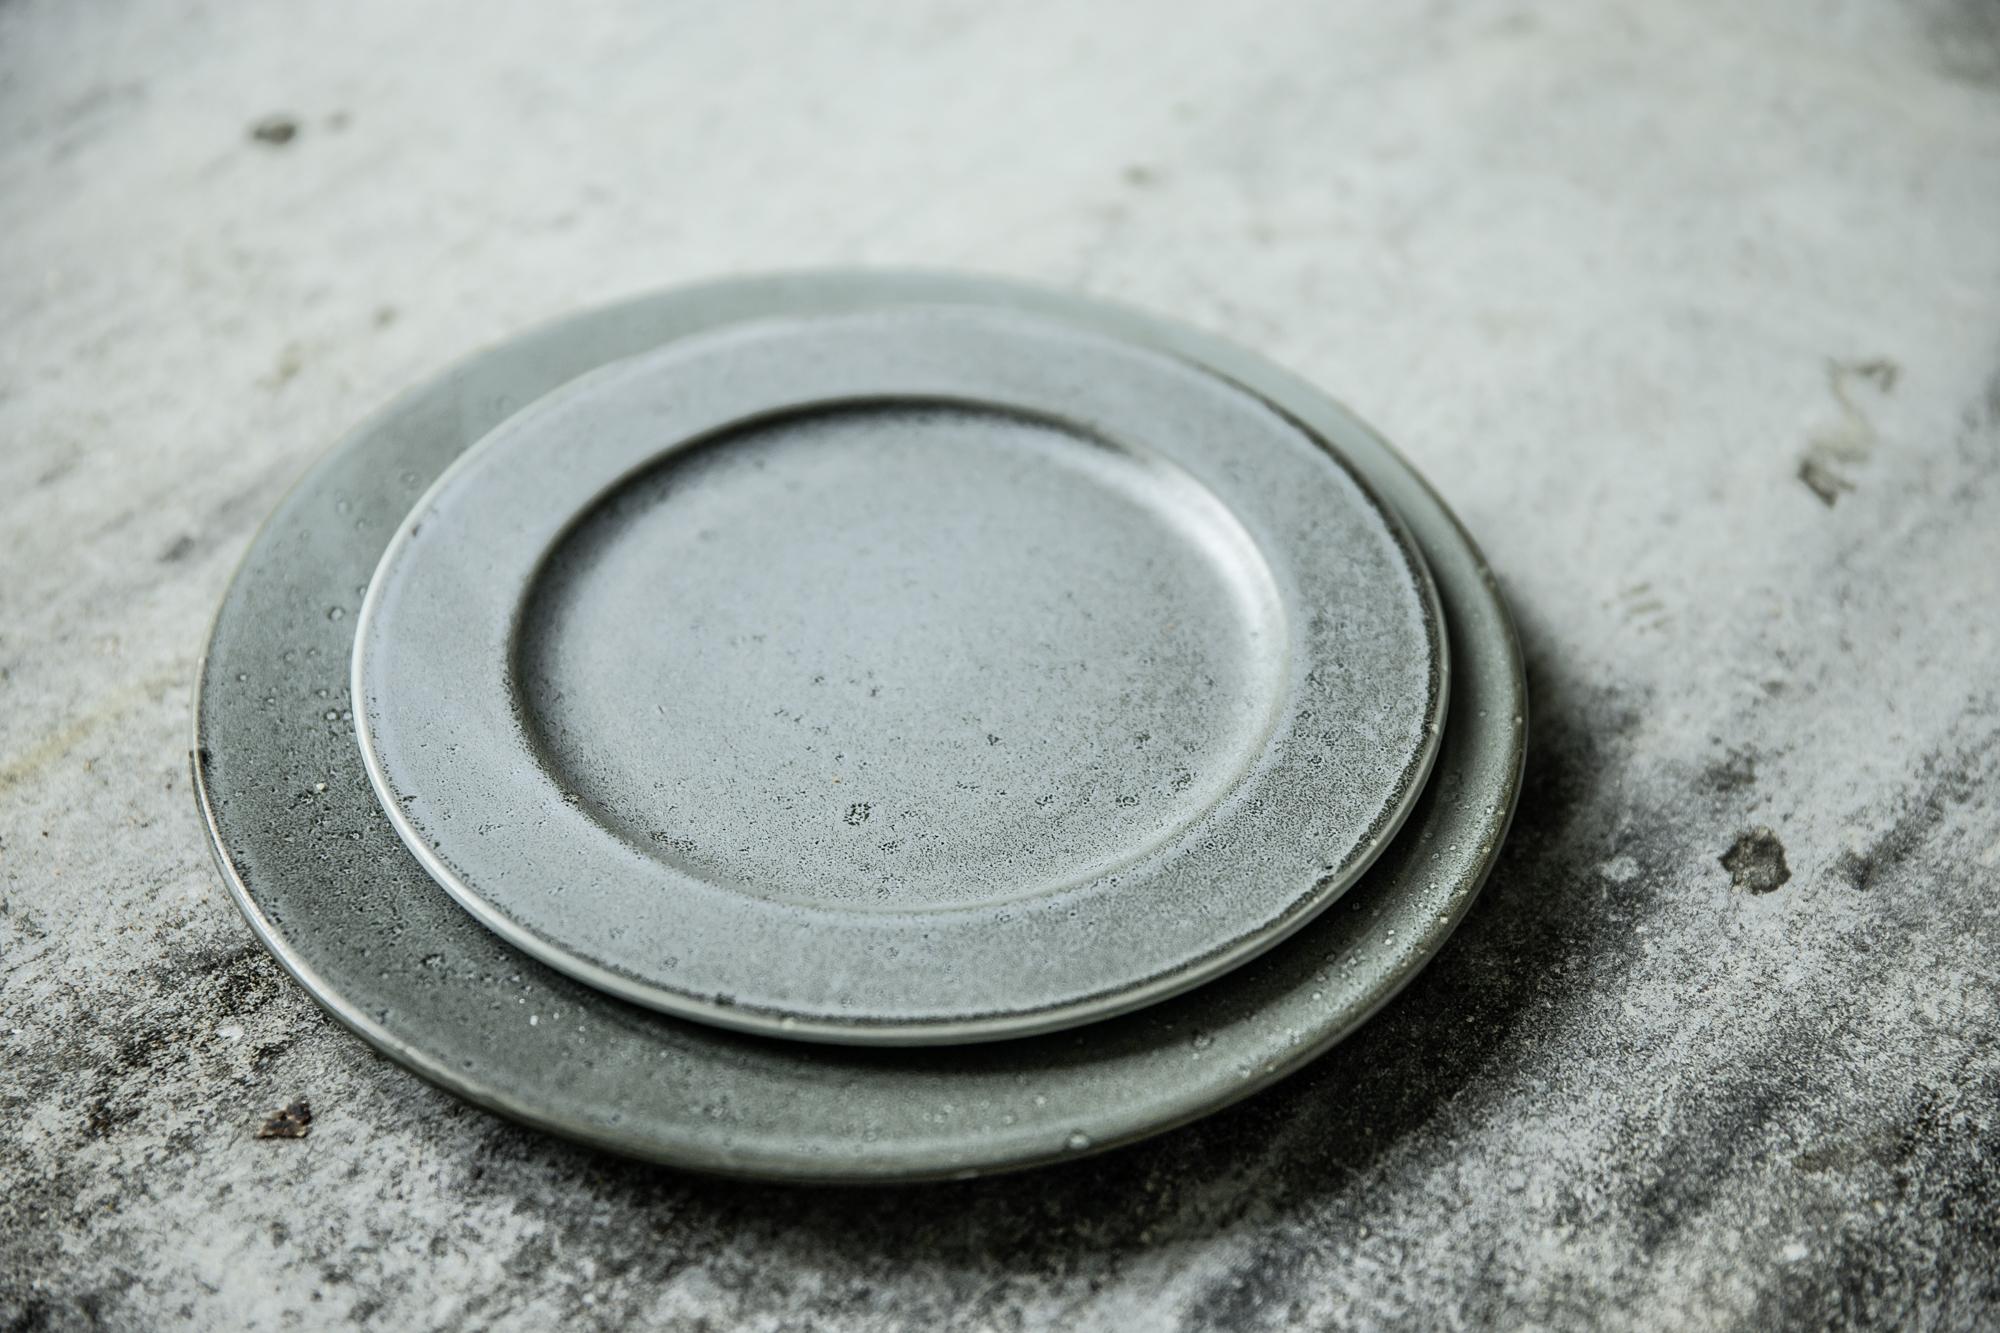 Food-Fotografie Meatlove, Stefan Schmidlin Fotograf Basel; Bild 7.jpg